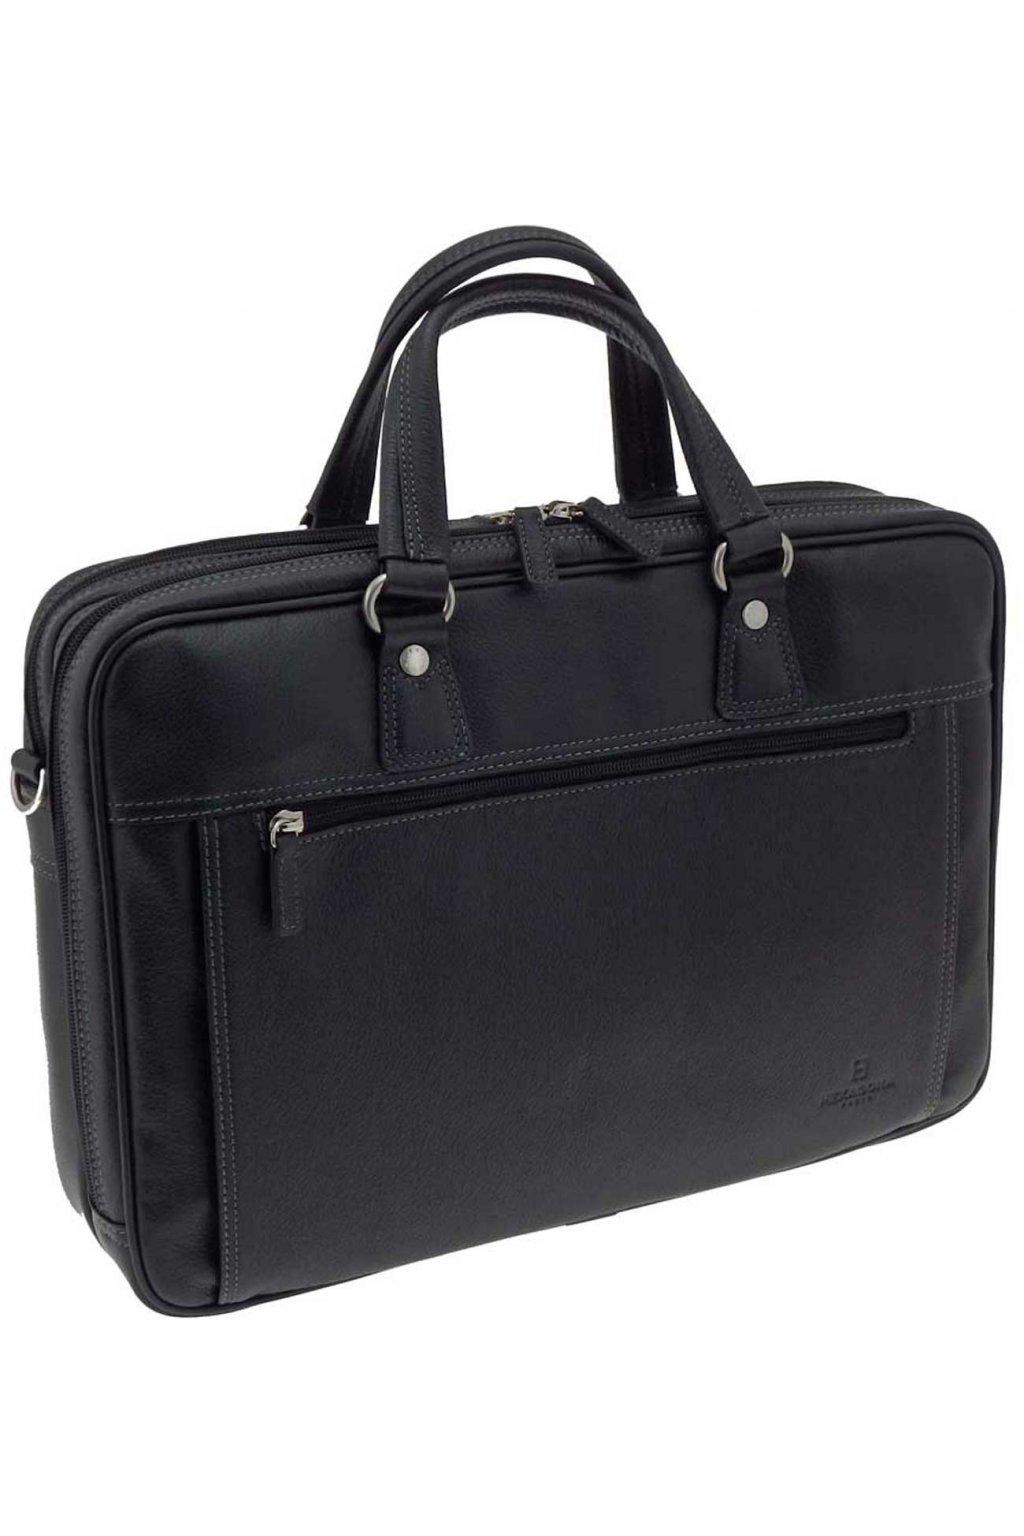 Pánská kožená taška černa PTK03 469544 C